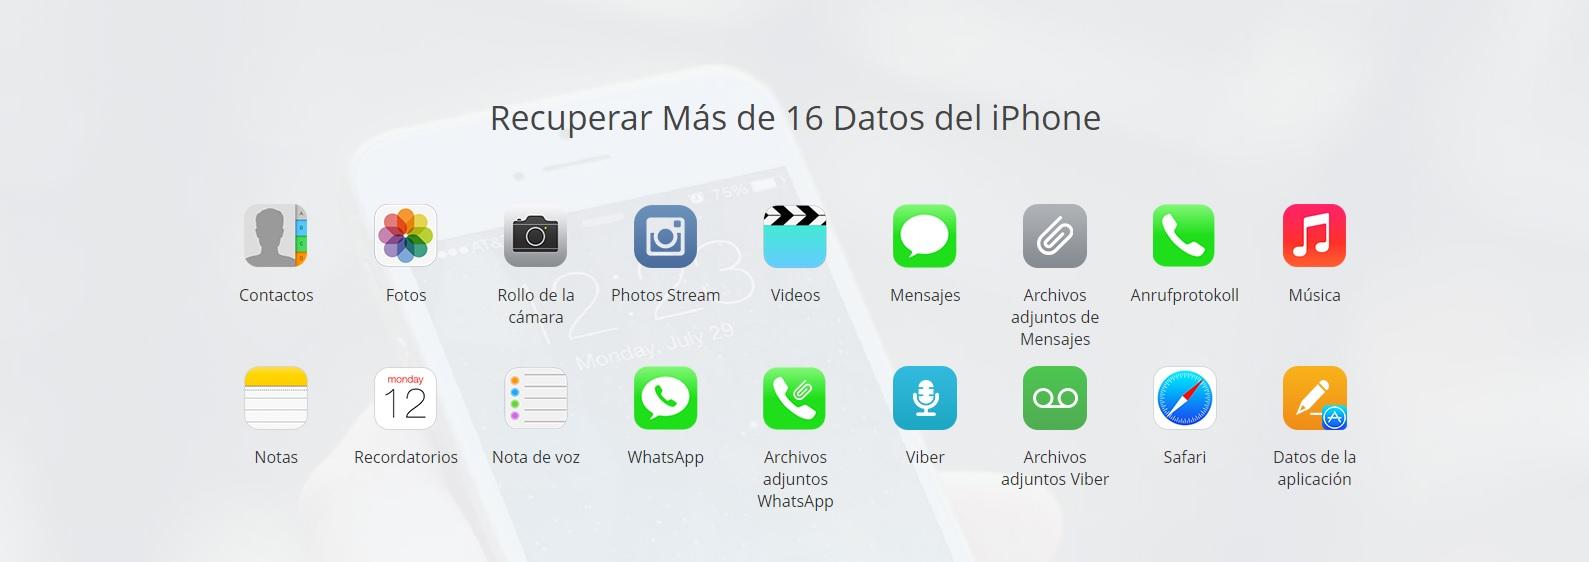 Jihosoft: Recupera datos en el iPhoneJihosoft: Recupera datos en el iPhone